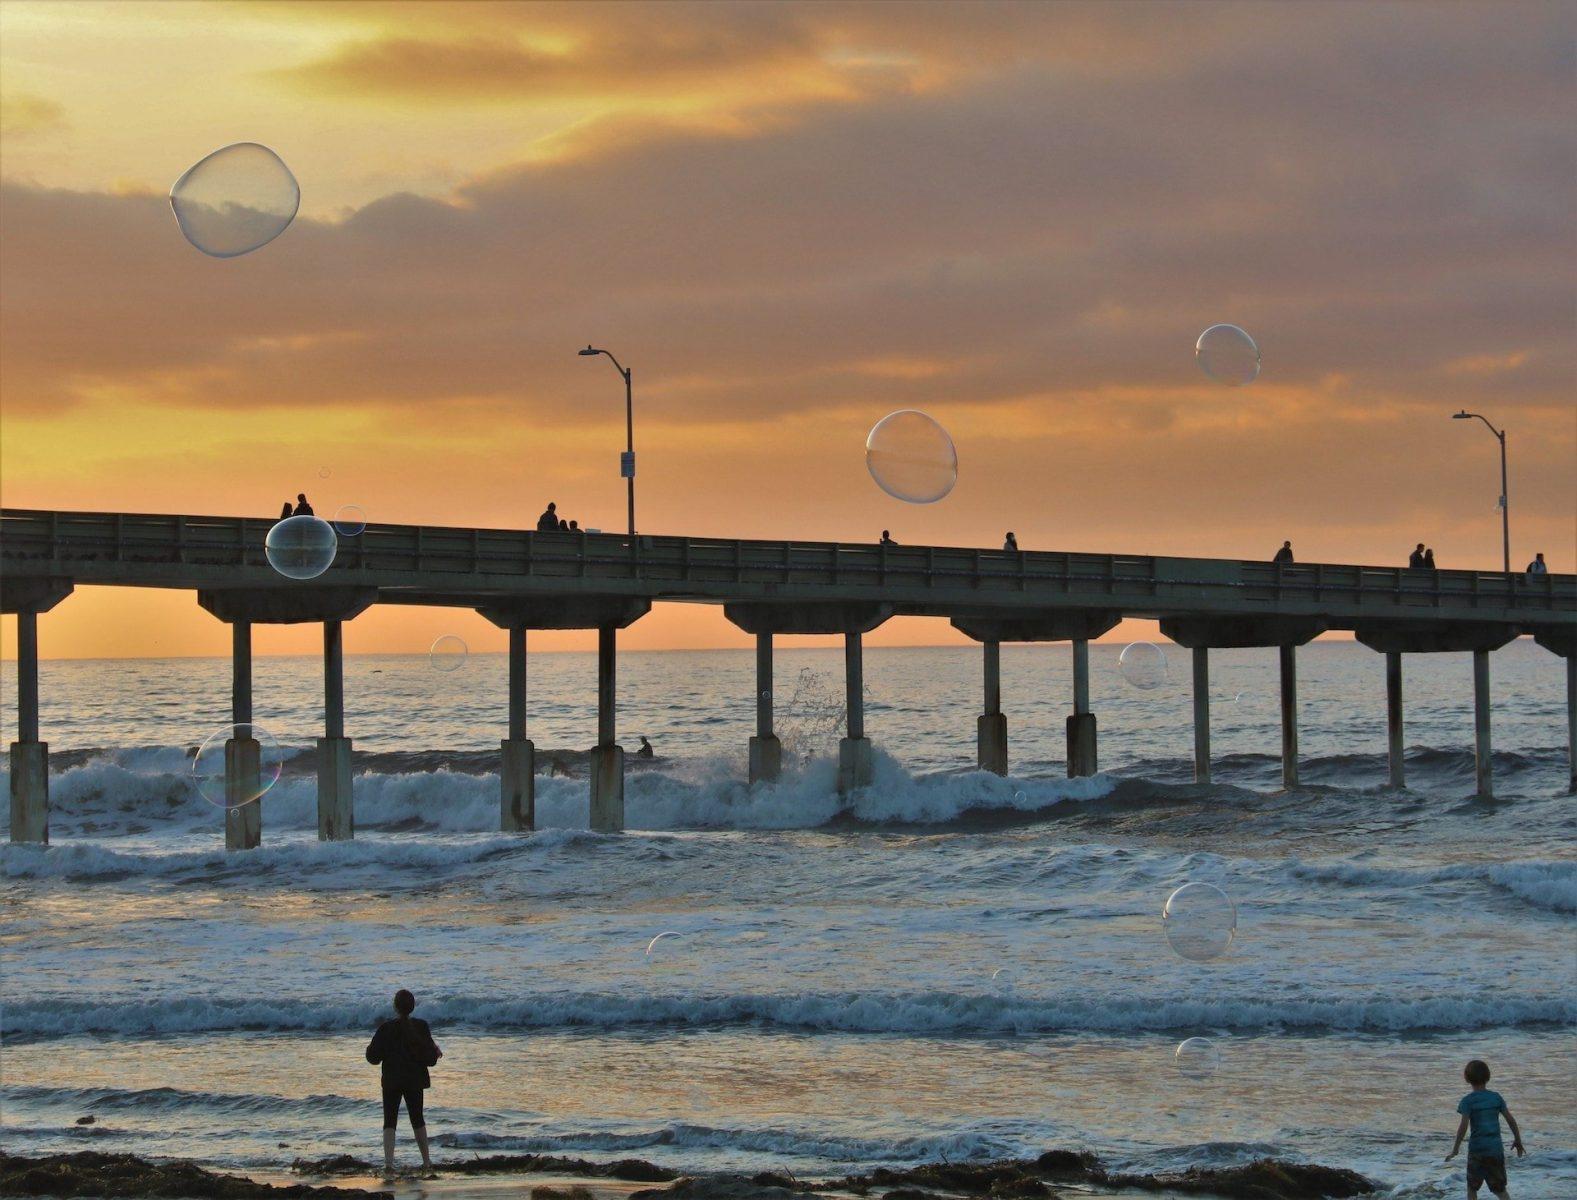 Barbara Whitman - Ocean Beach Pier Twilight Balloon Chase